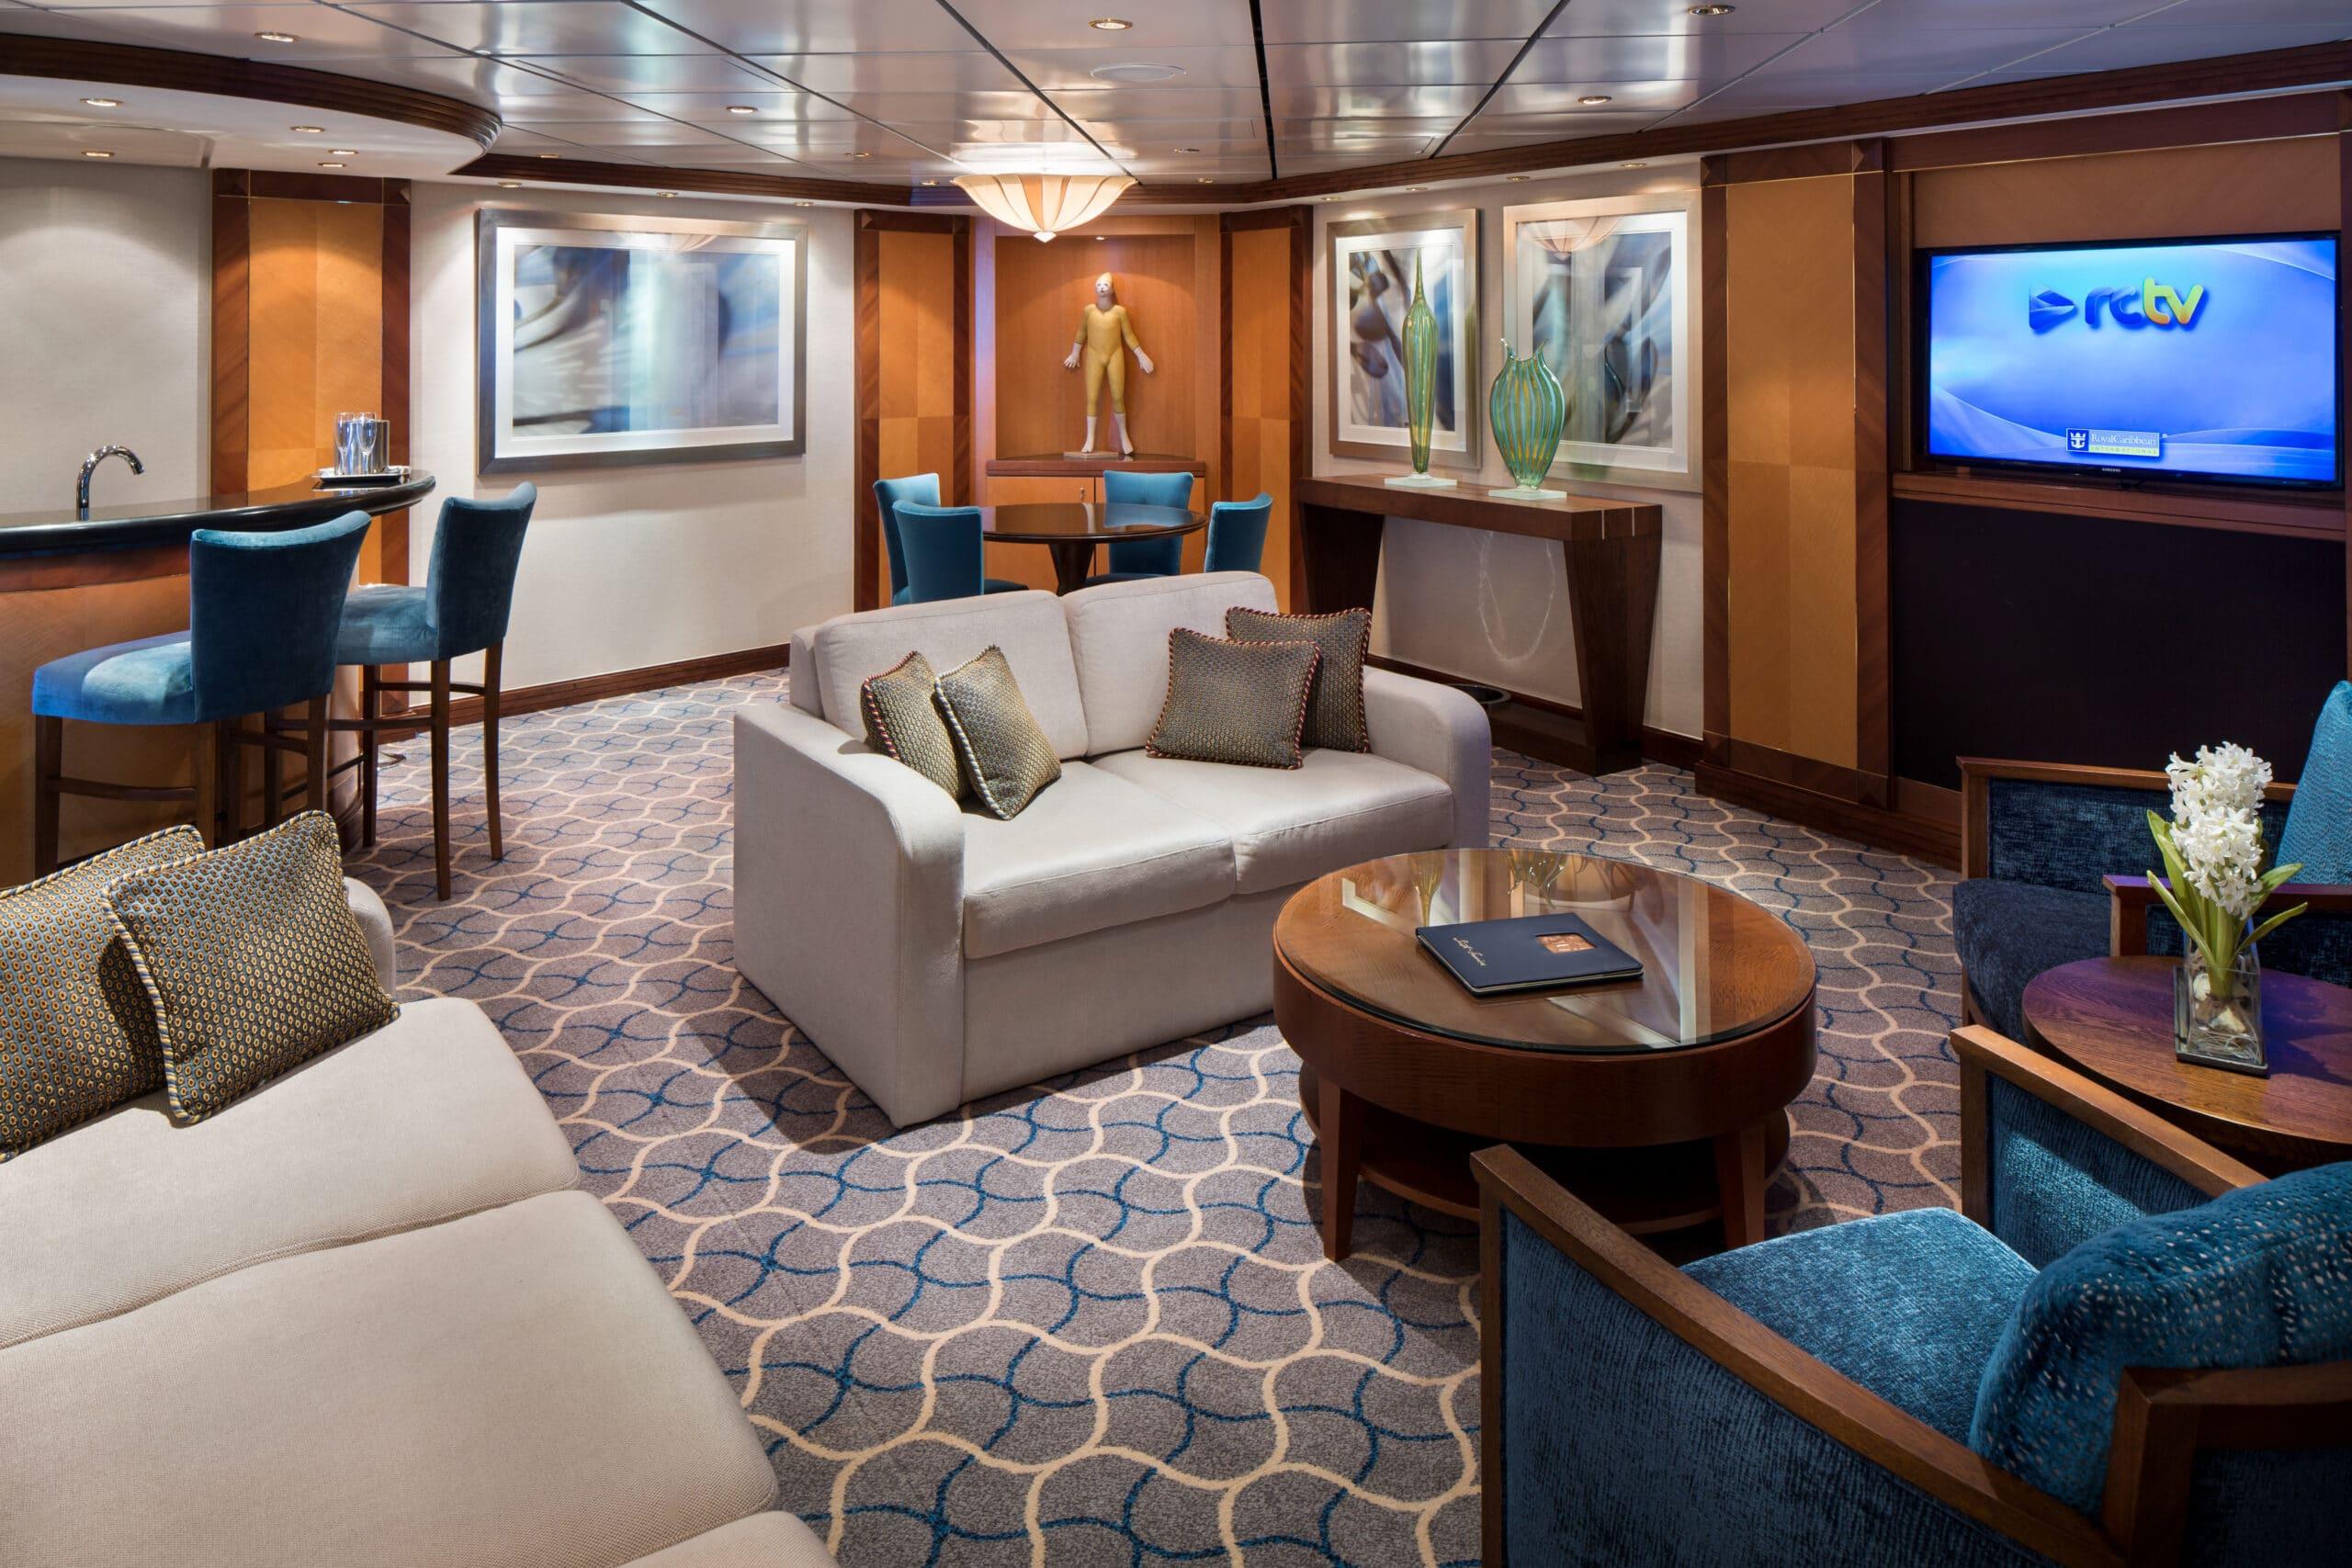 Royal-Caribbean-International-Jewel-of-the-Seas-schip-cruiseschip-categorie-RS-Royal-Suite